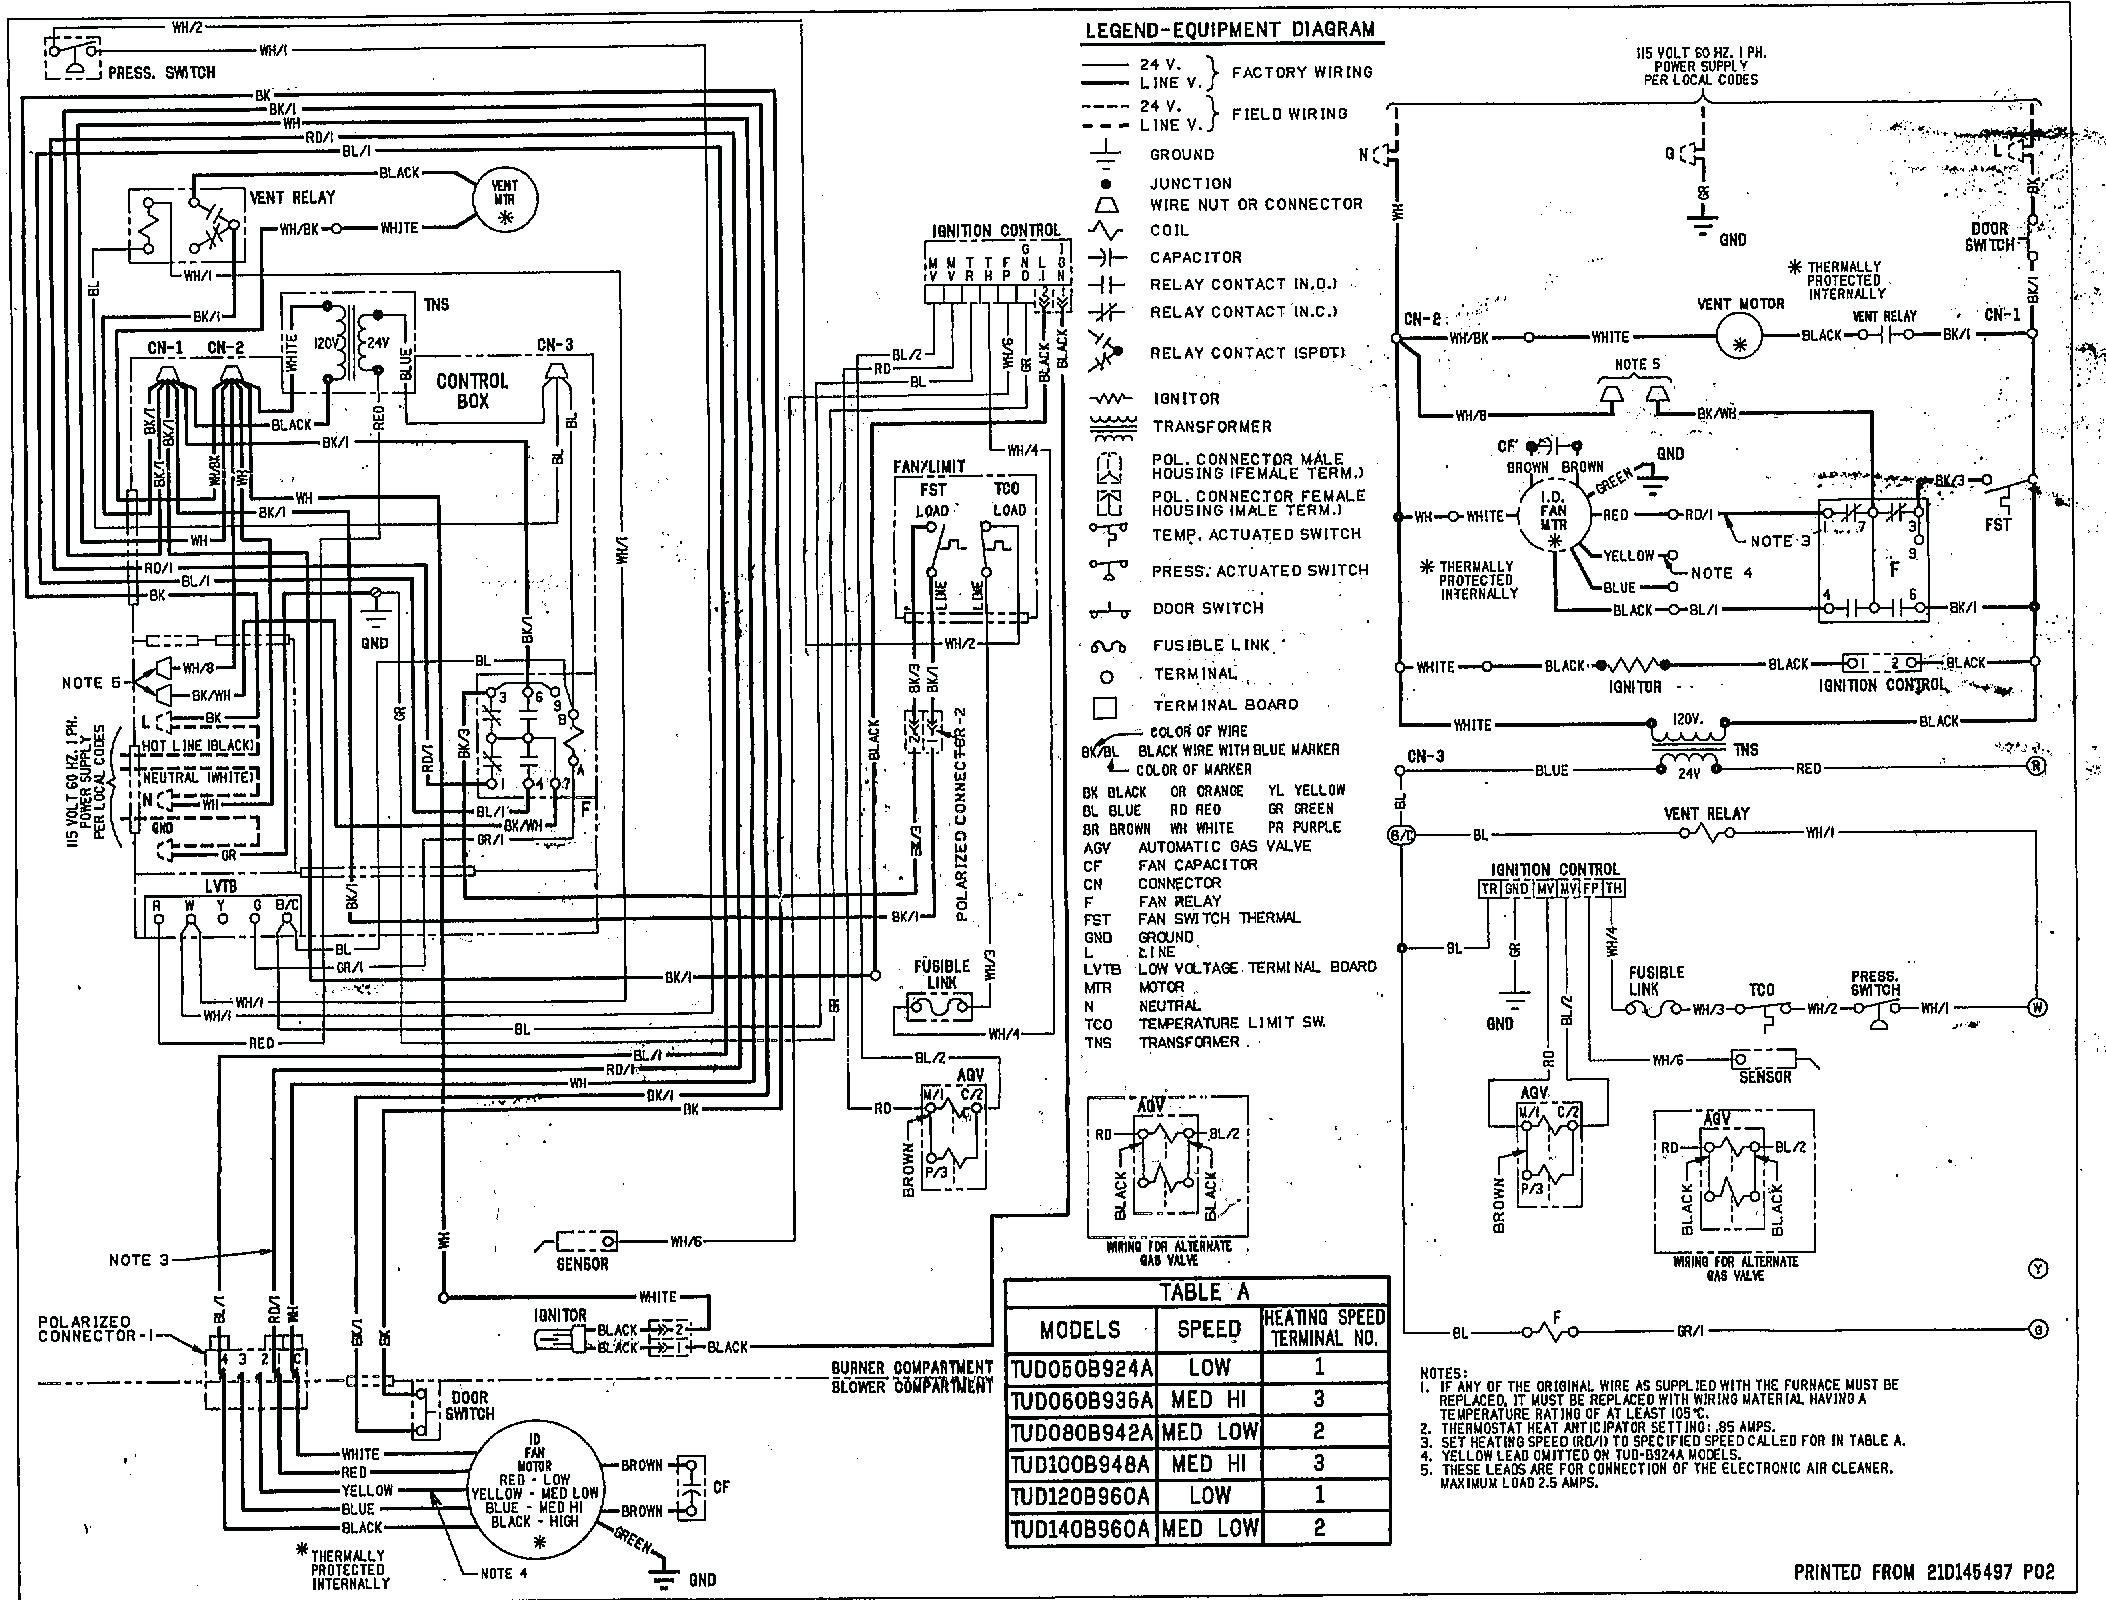 american standard furnace wiring diagram american standard furnace wiring diagram diagrams heat pump ac unit of american standard furnace wiring diagram american standard wire diagram wiring diagram